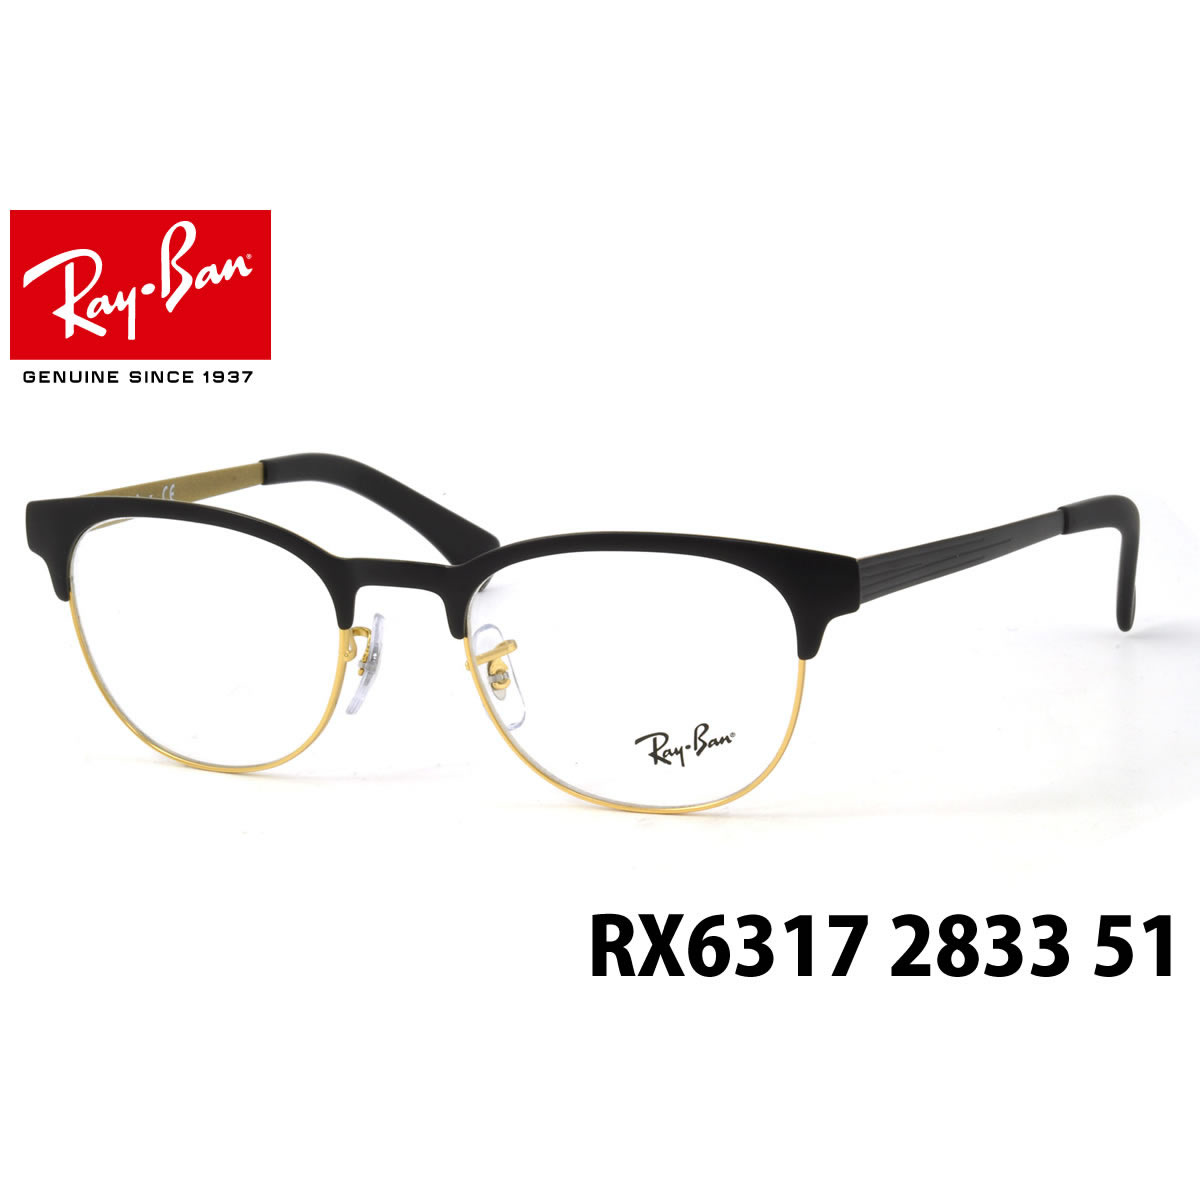 9615042fa01 (Ray-Ban) glasses frames RX6317 2833 51 size Ray Ban RAYBAN men s women s